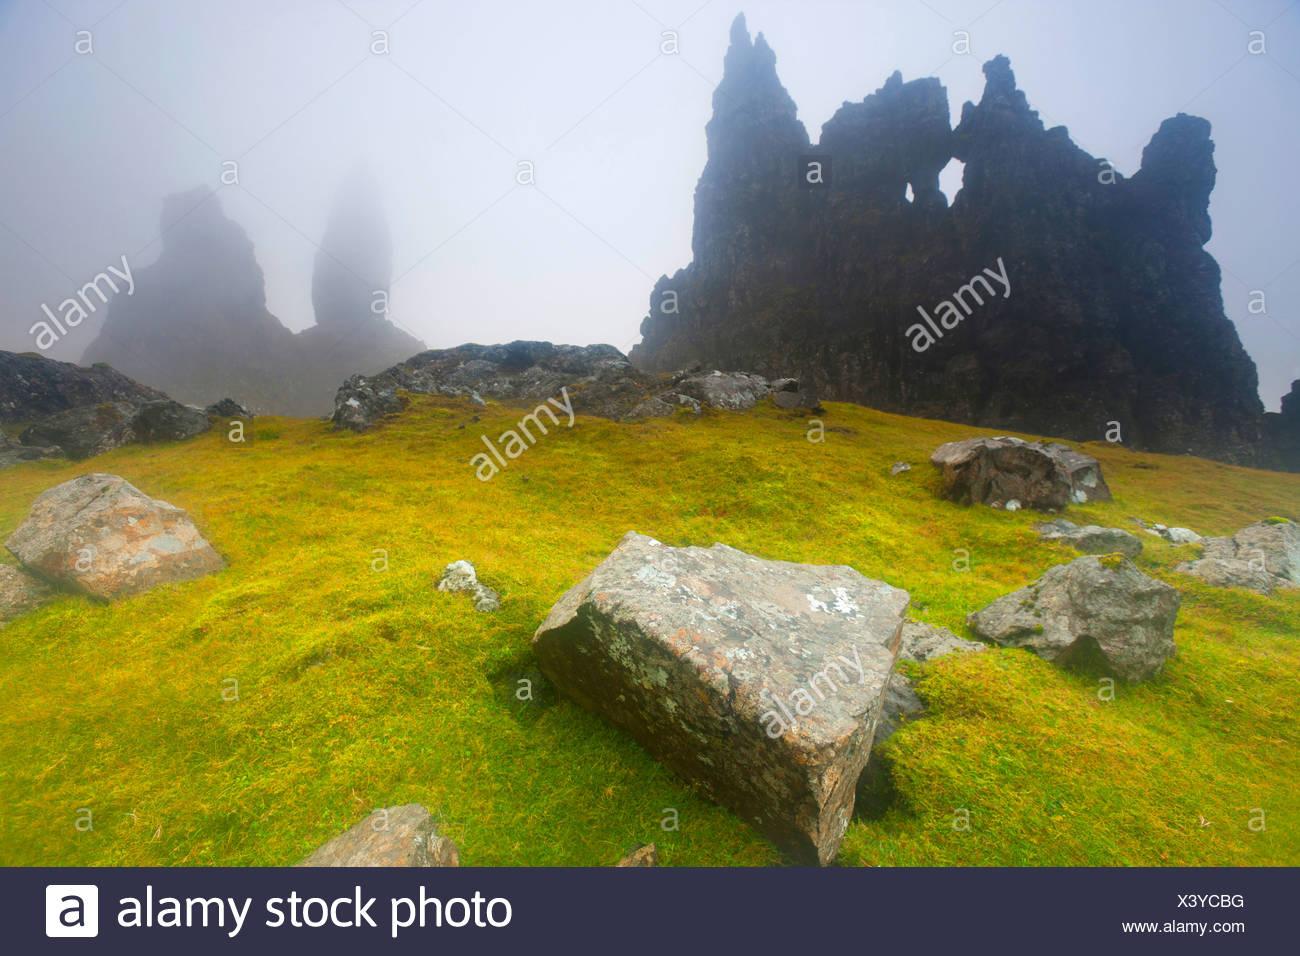 Old Man of Storr, Old Man, Storr, Great Britain, Europe, Scotland, island, isle, Skye, meadow, rock, cliff, erosion, fog - Stock Image